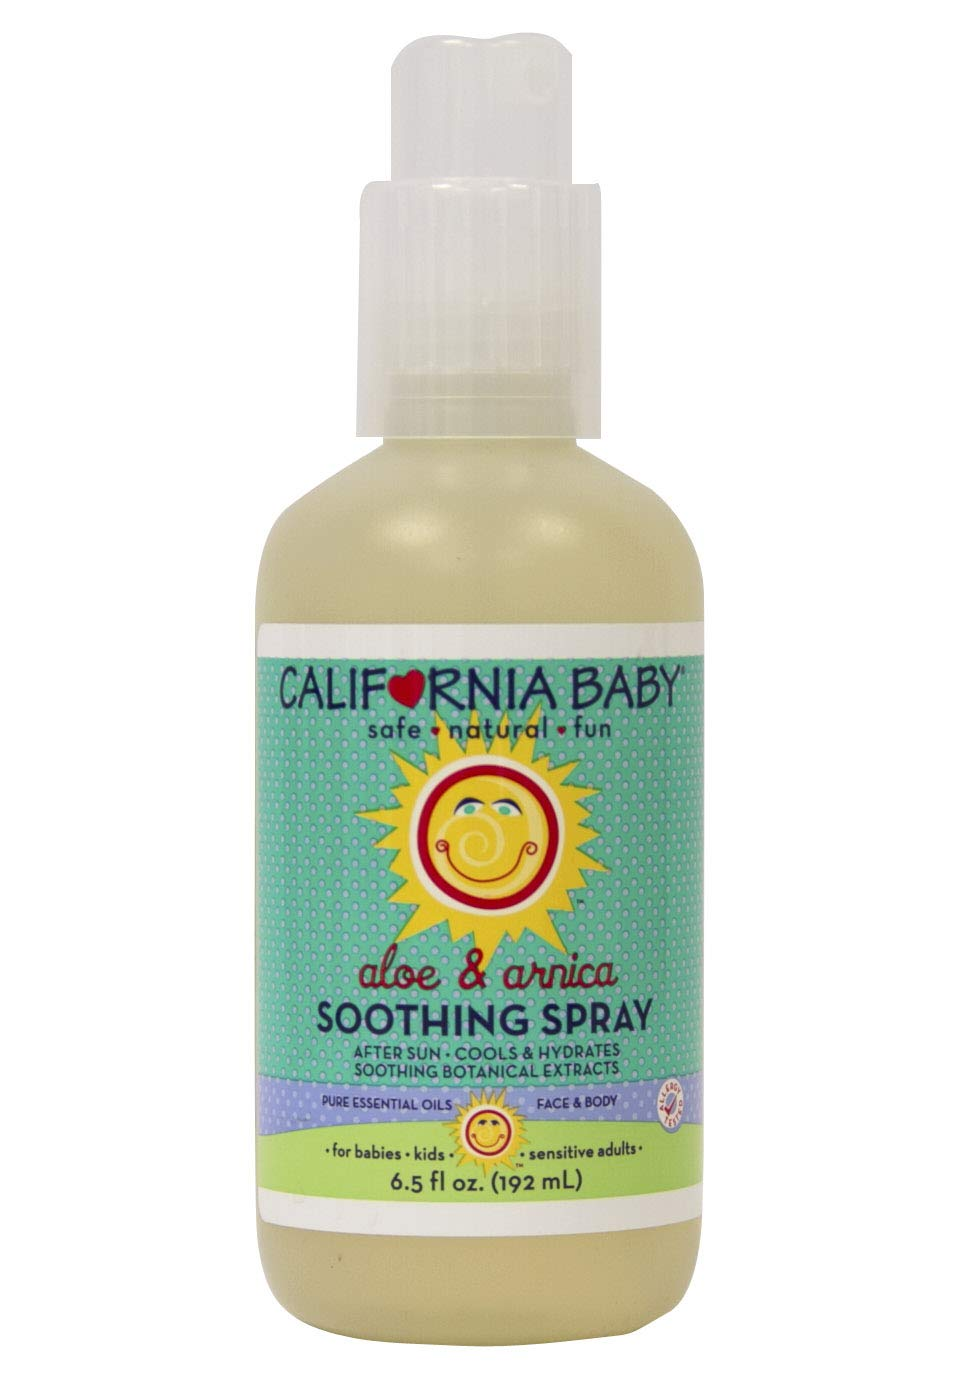 California Baby Aloe & Arnica Soothing Spray, 6.5 oz